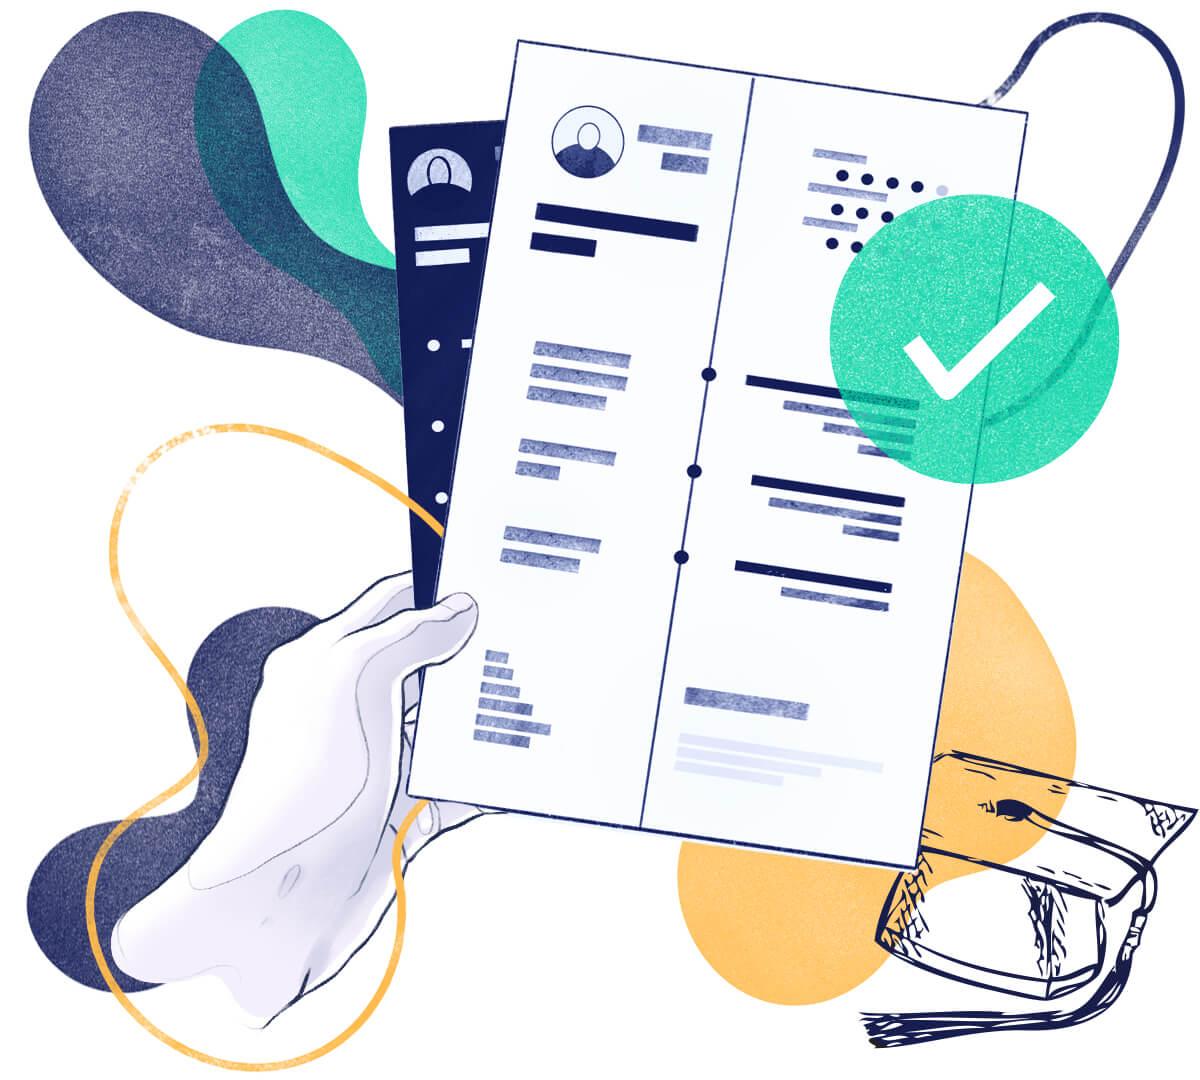 Recent University Graduate CV—Examples and 25+ Tips